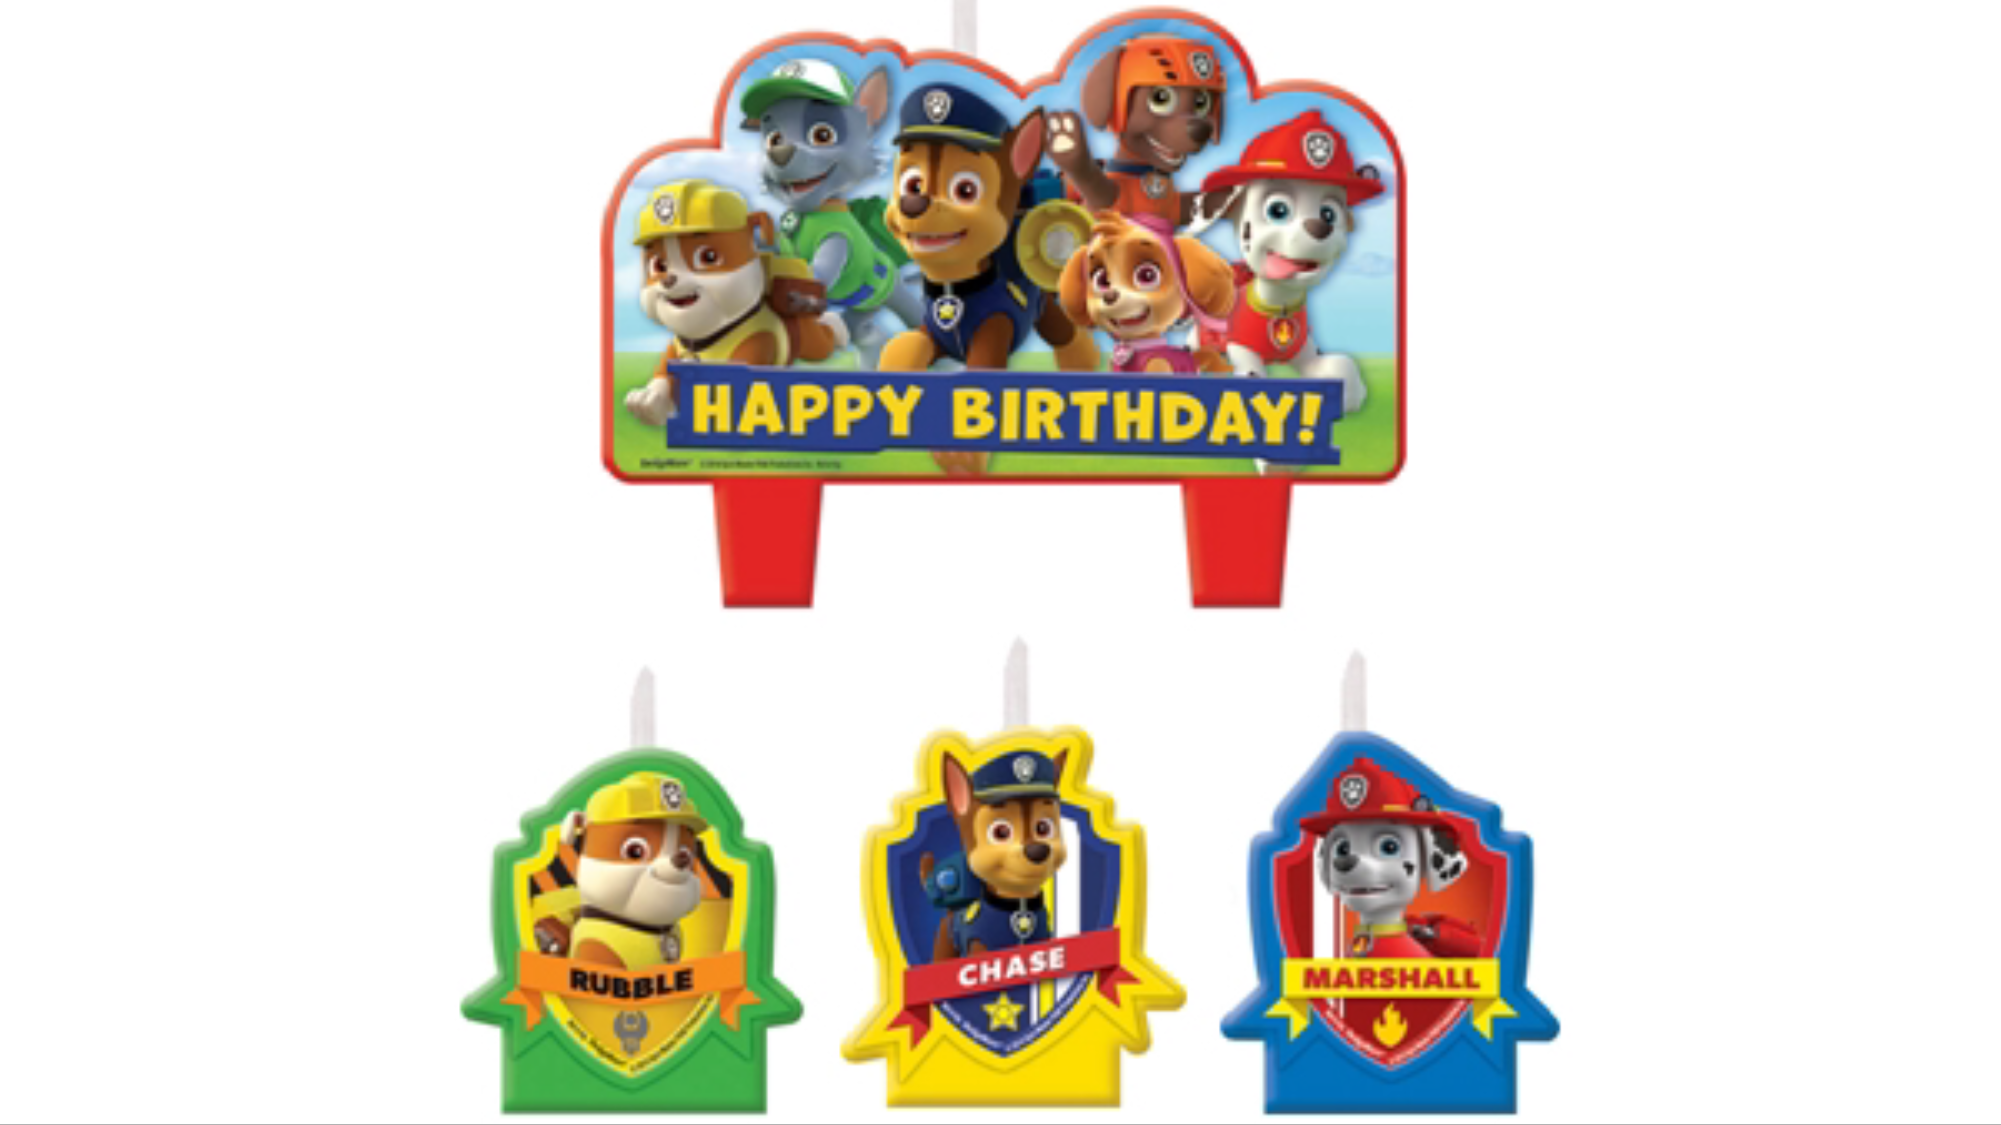 Paw Patrol birthday candles